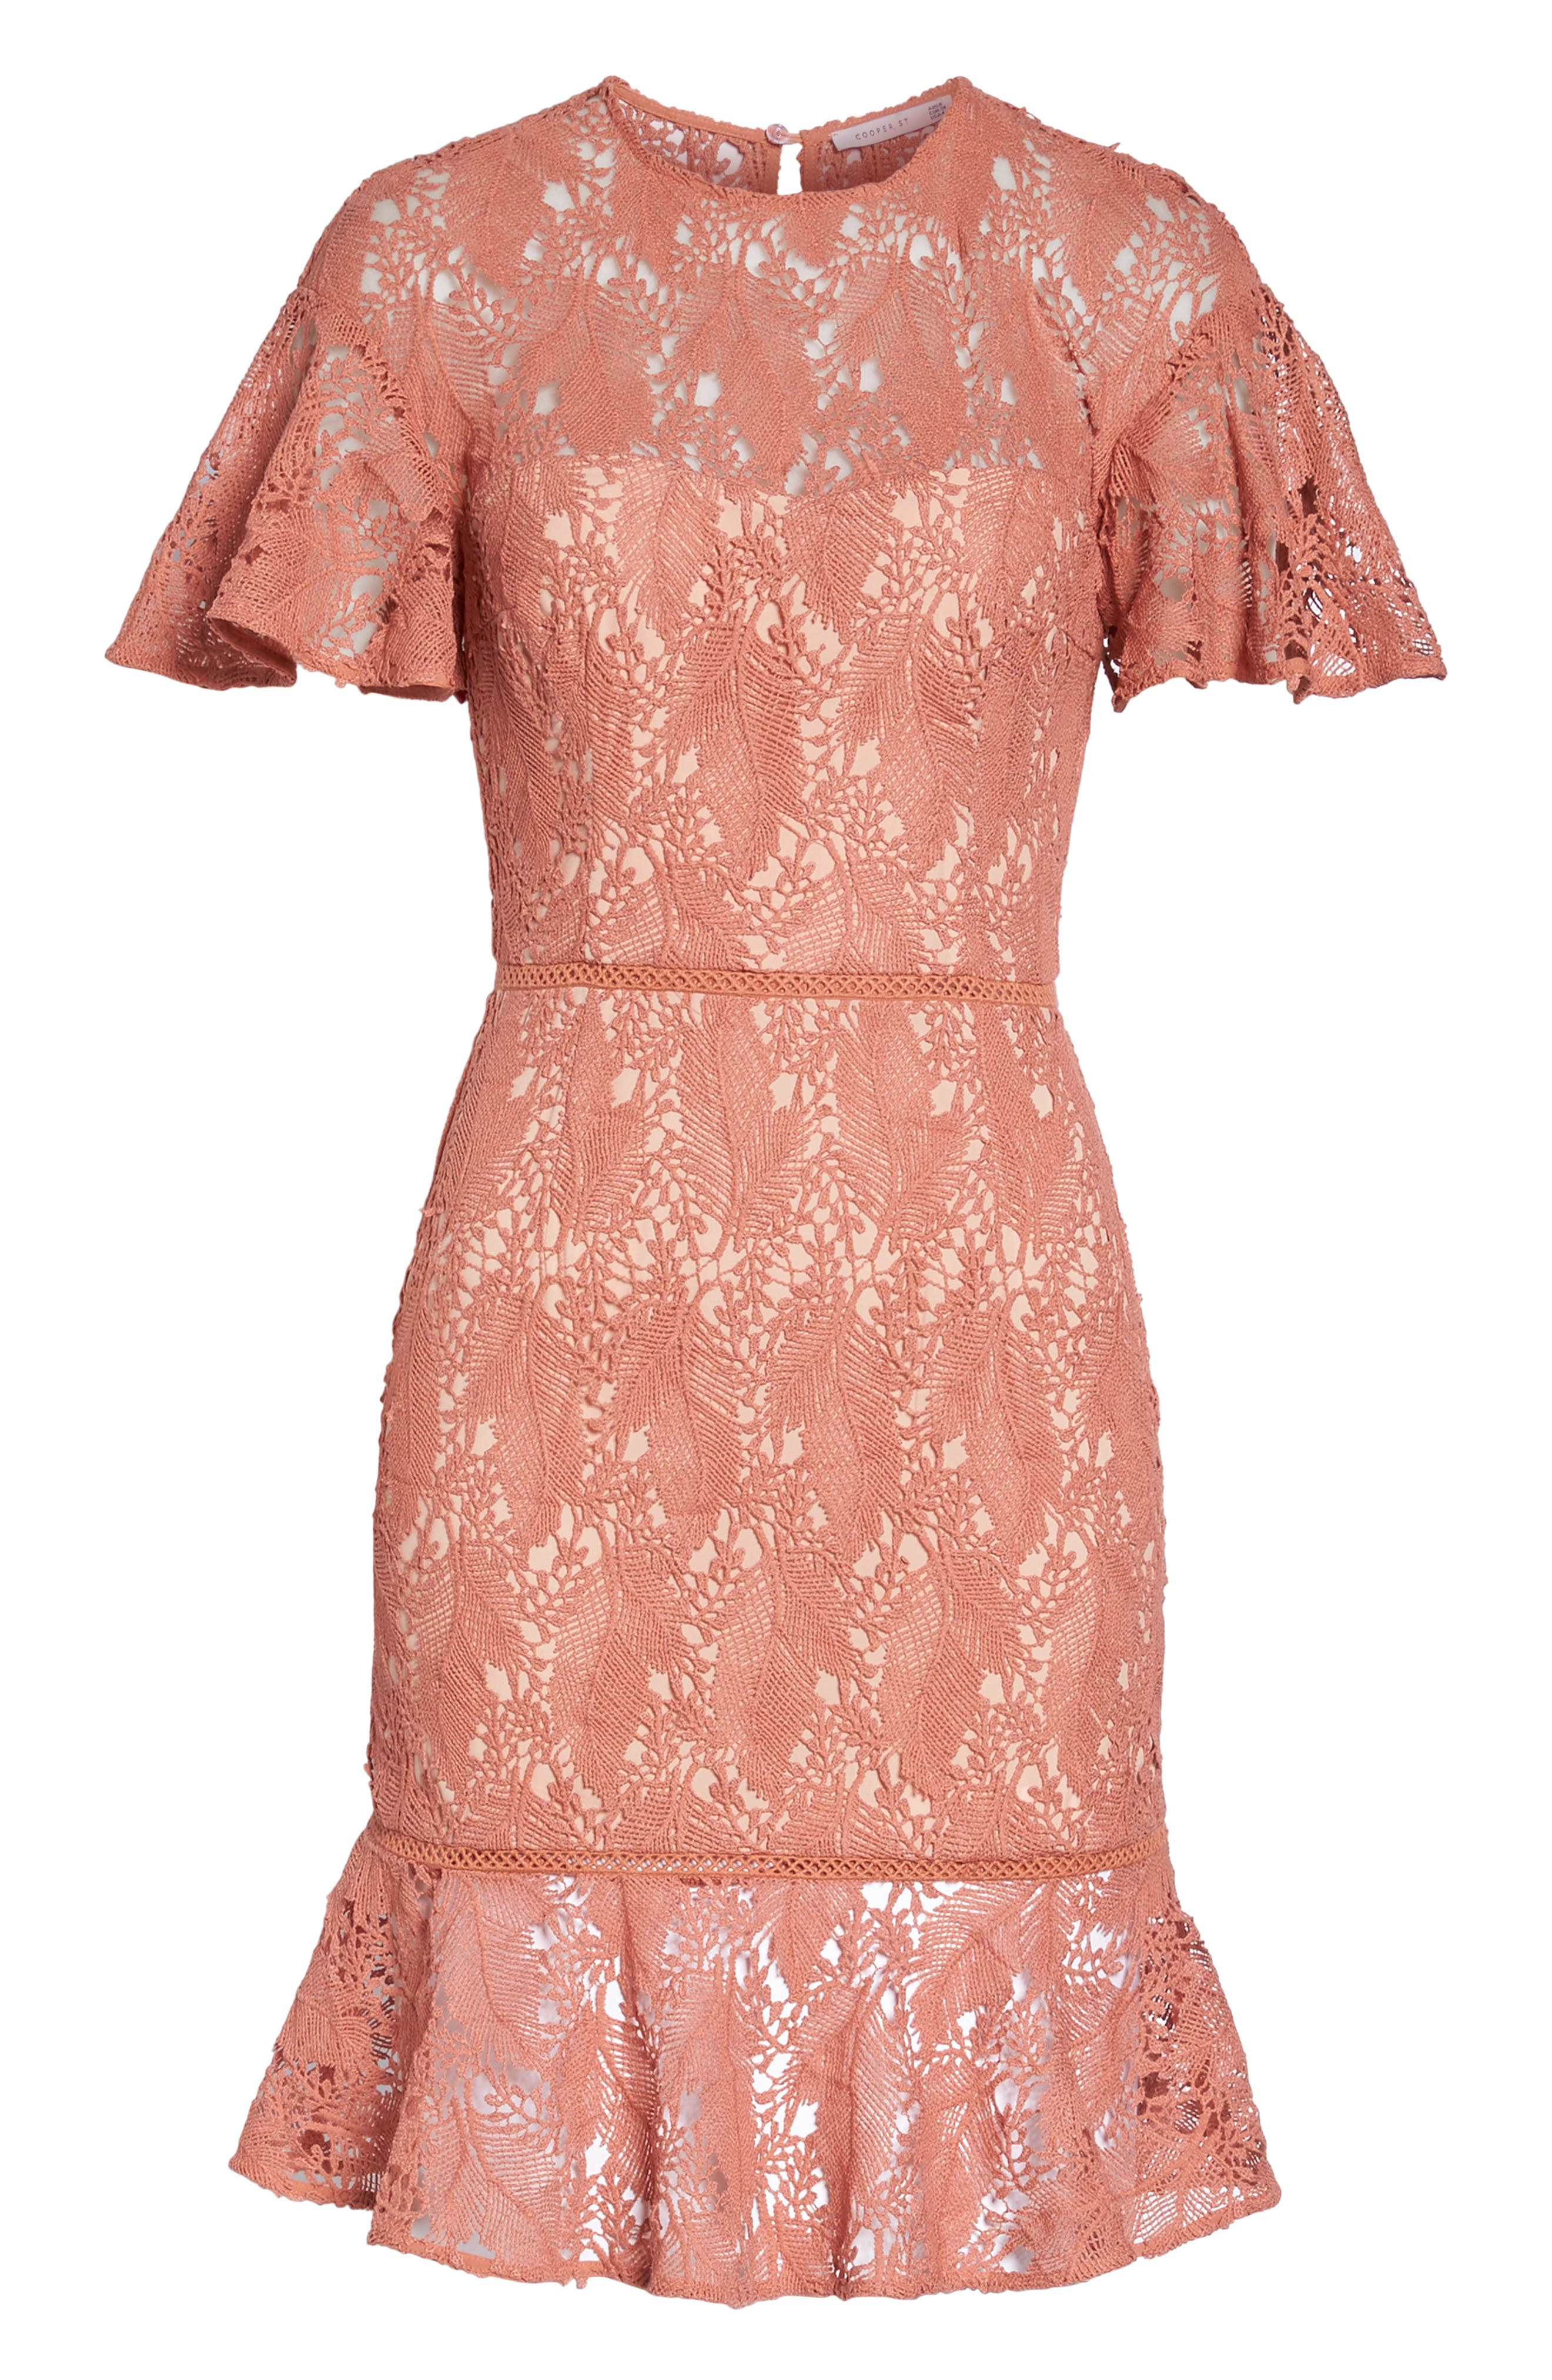 Monaco Flounce Hem Dress,                             Alternate thumbnail 6, color,                             680